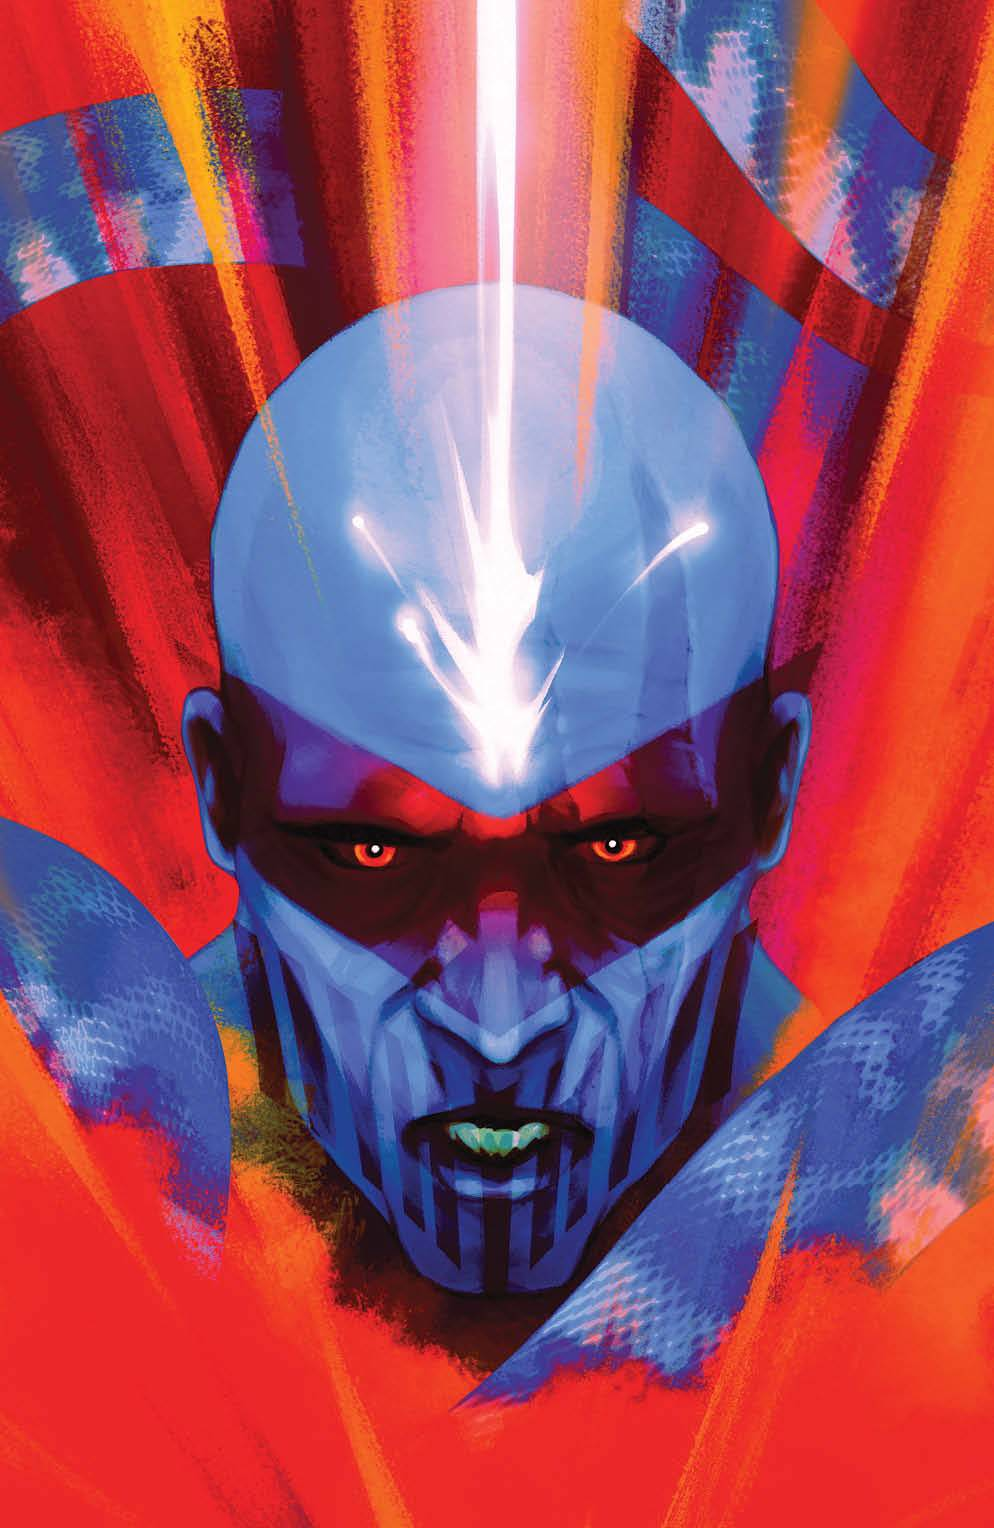 STL194186 ComicList Previews: POWER RANGERS #10